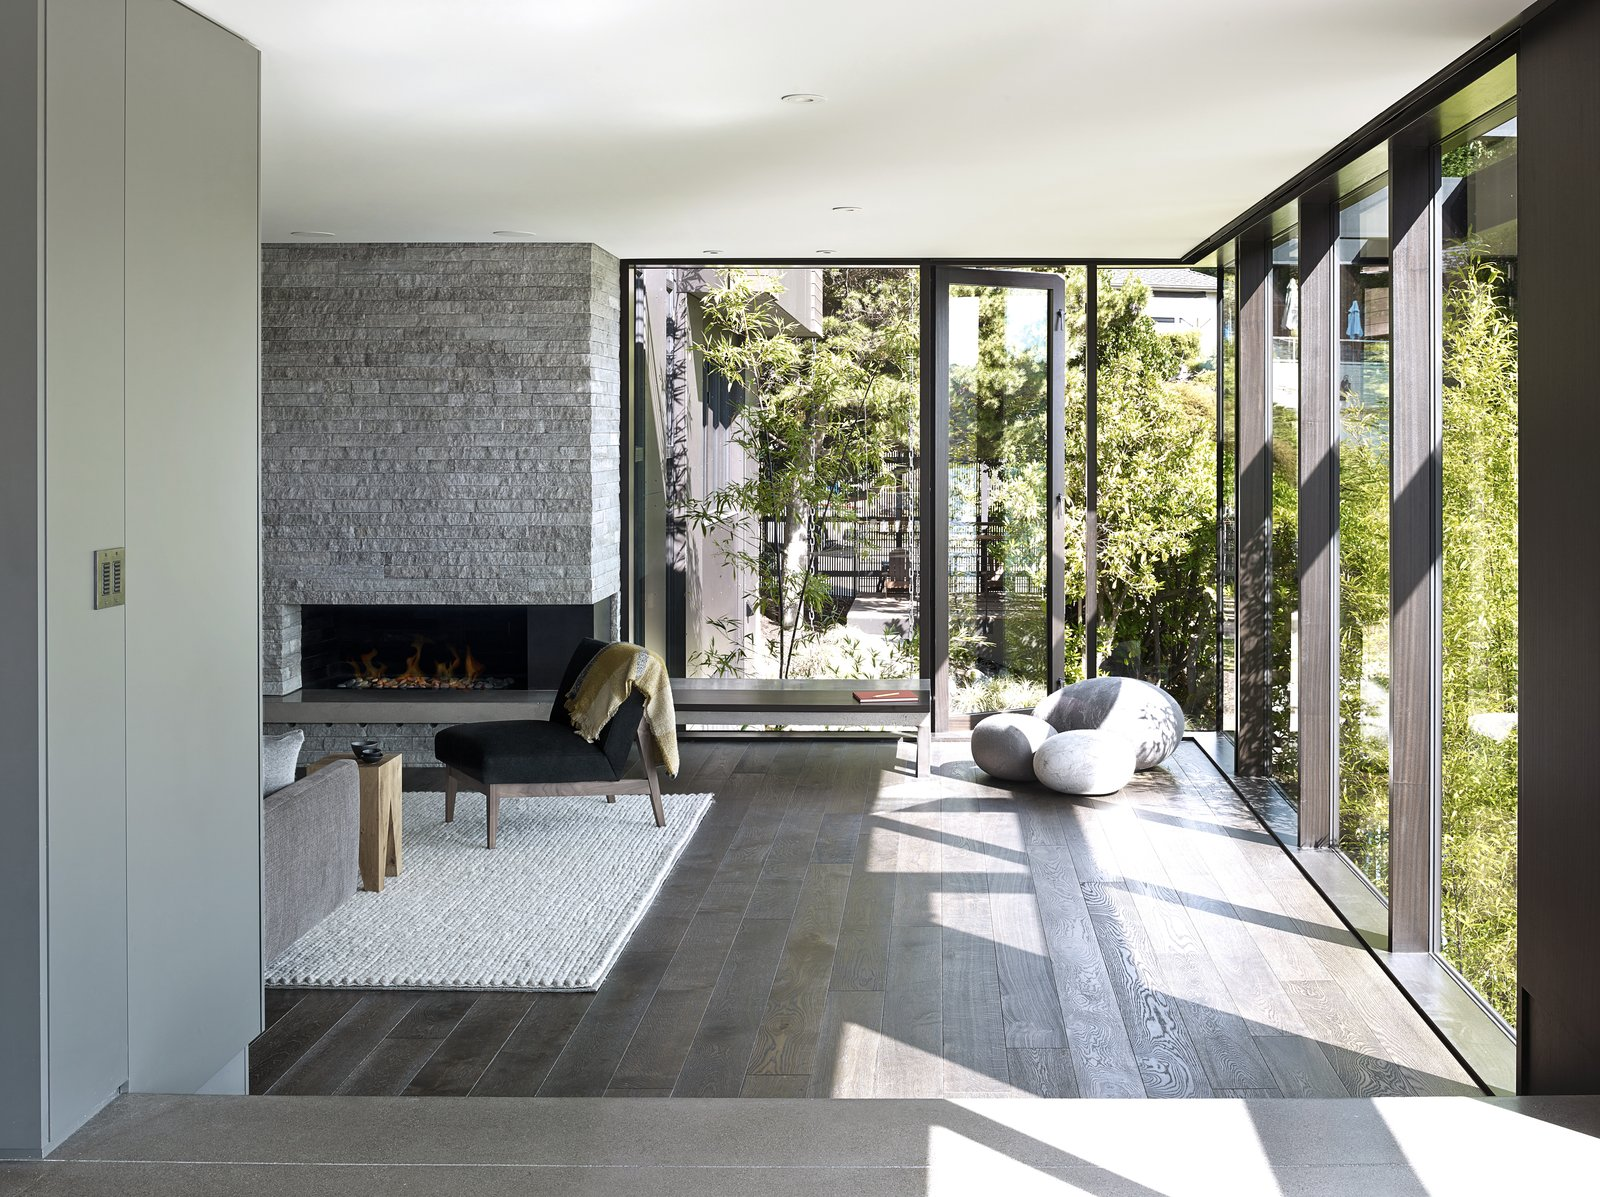 Laurelhurst Residence Tagged: Living Room, Medium Hardwood Floor, and Standard Layout Fireplace.  Laurelhurst Residence by mw works